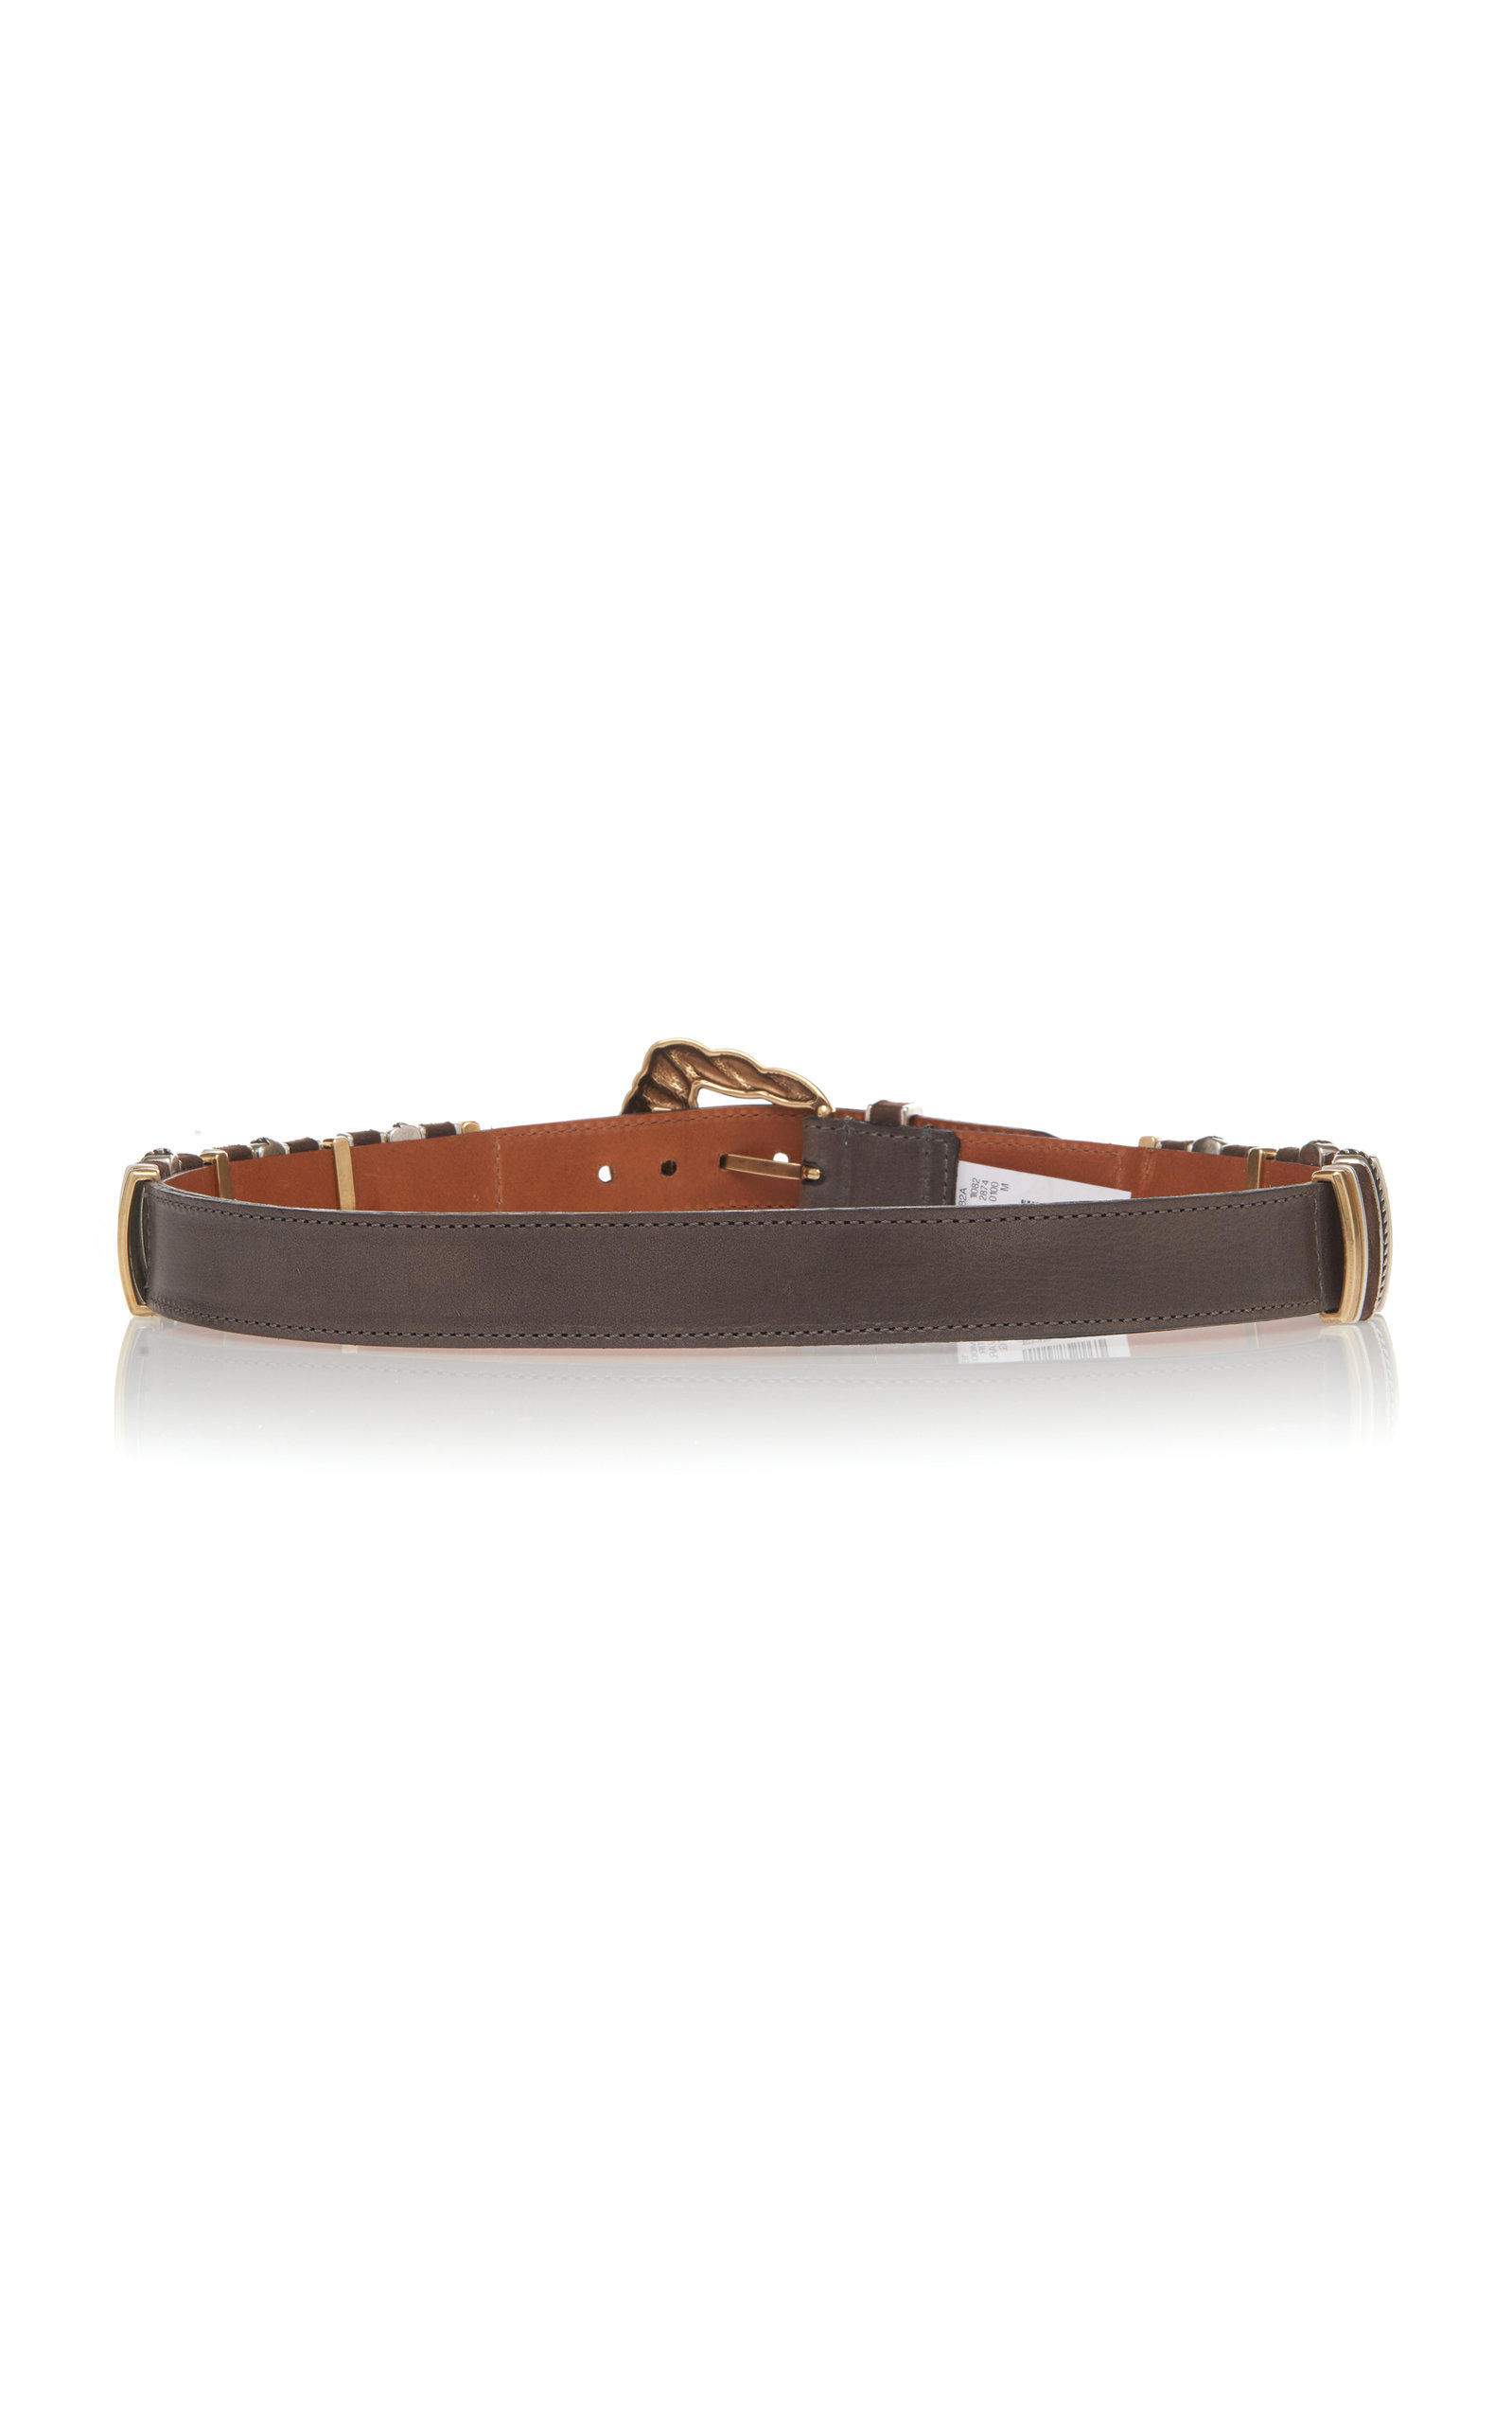 9eadea9d4 Cintura Donna Belt by Etro   Moda Operandi